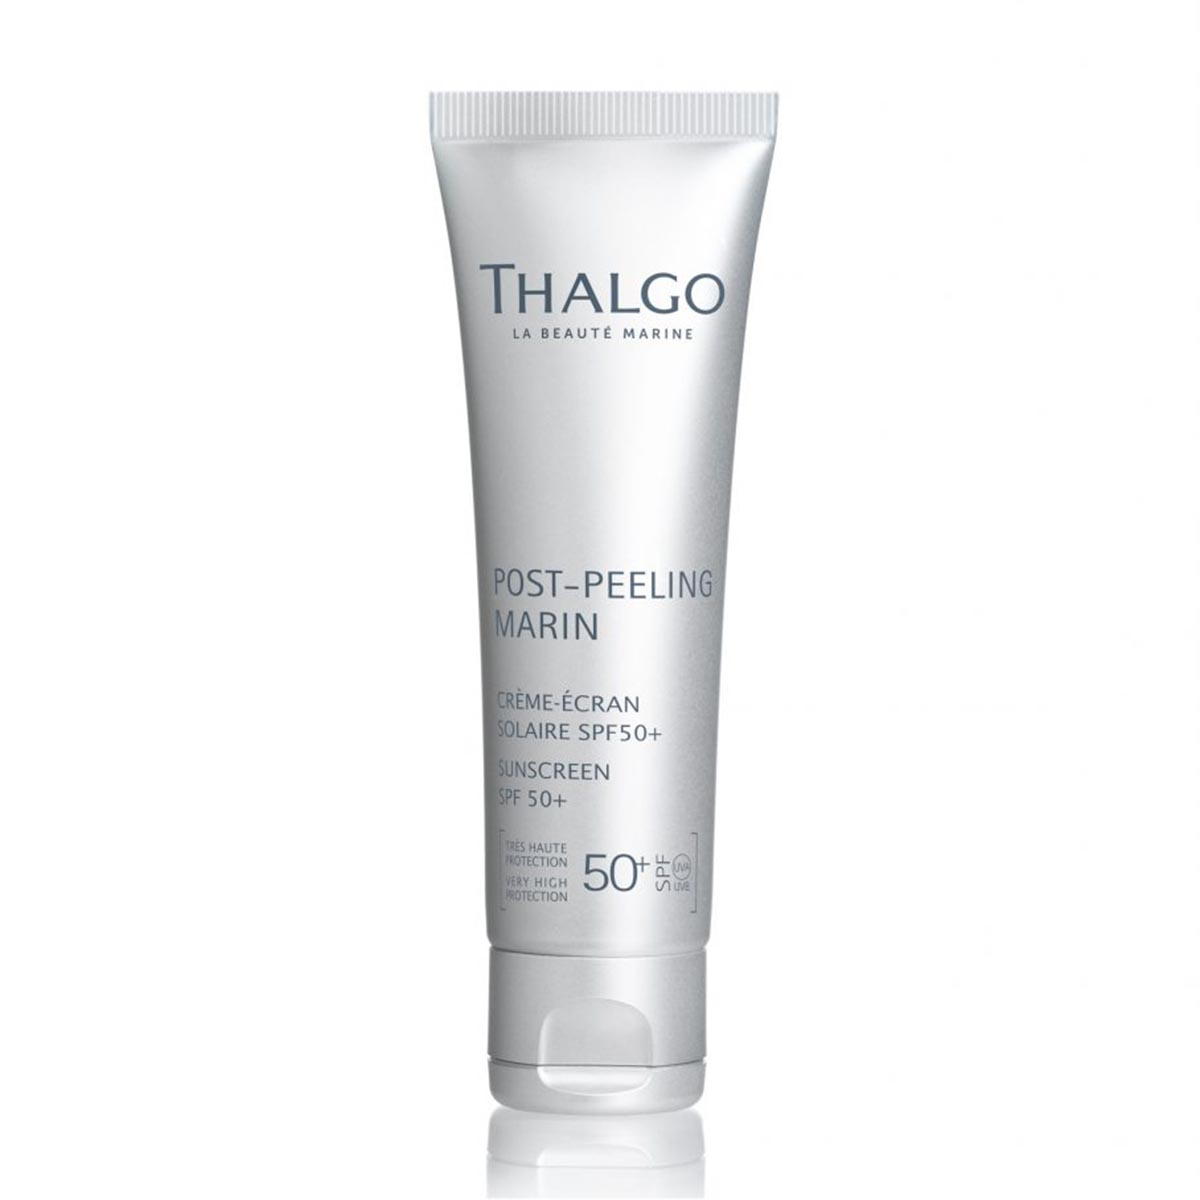 Thalgo post peeling marin sunscreen spf50 50ml